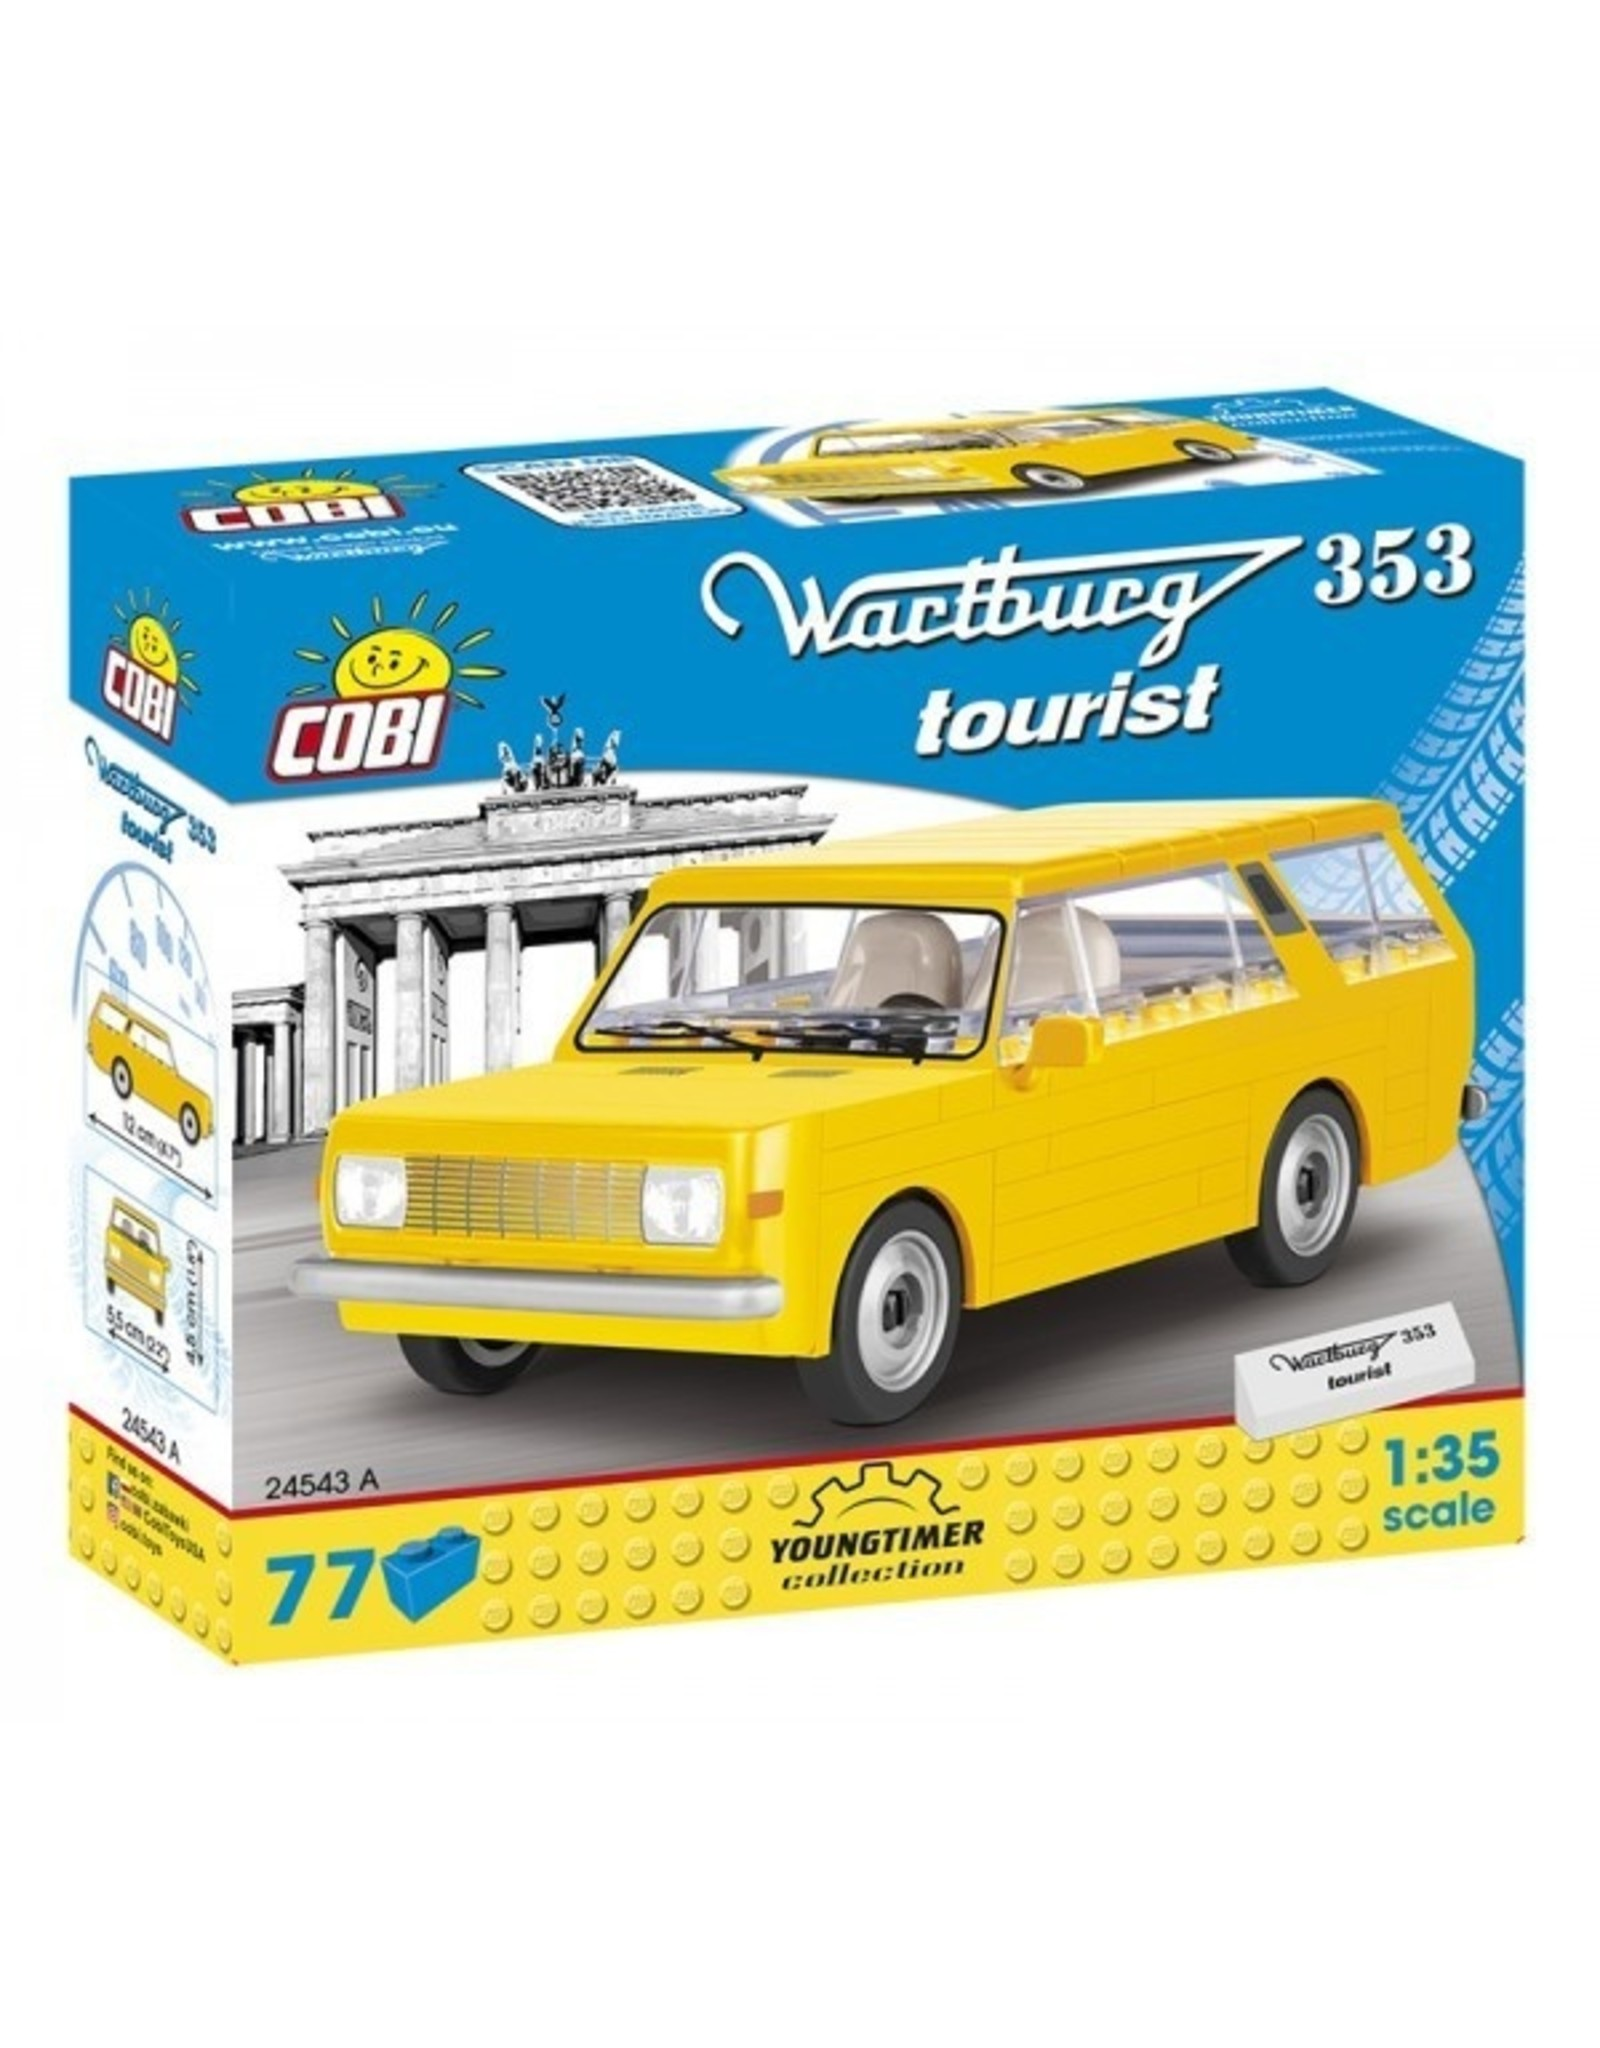 COBI COBI 24543A - Wartburg 353 Toerist